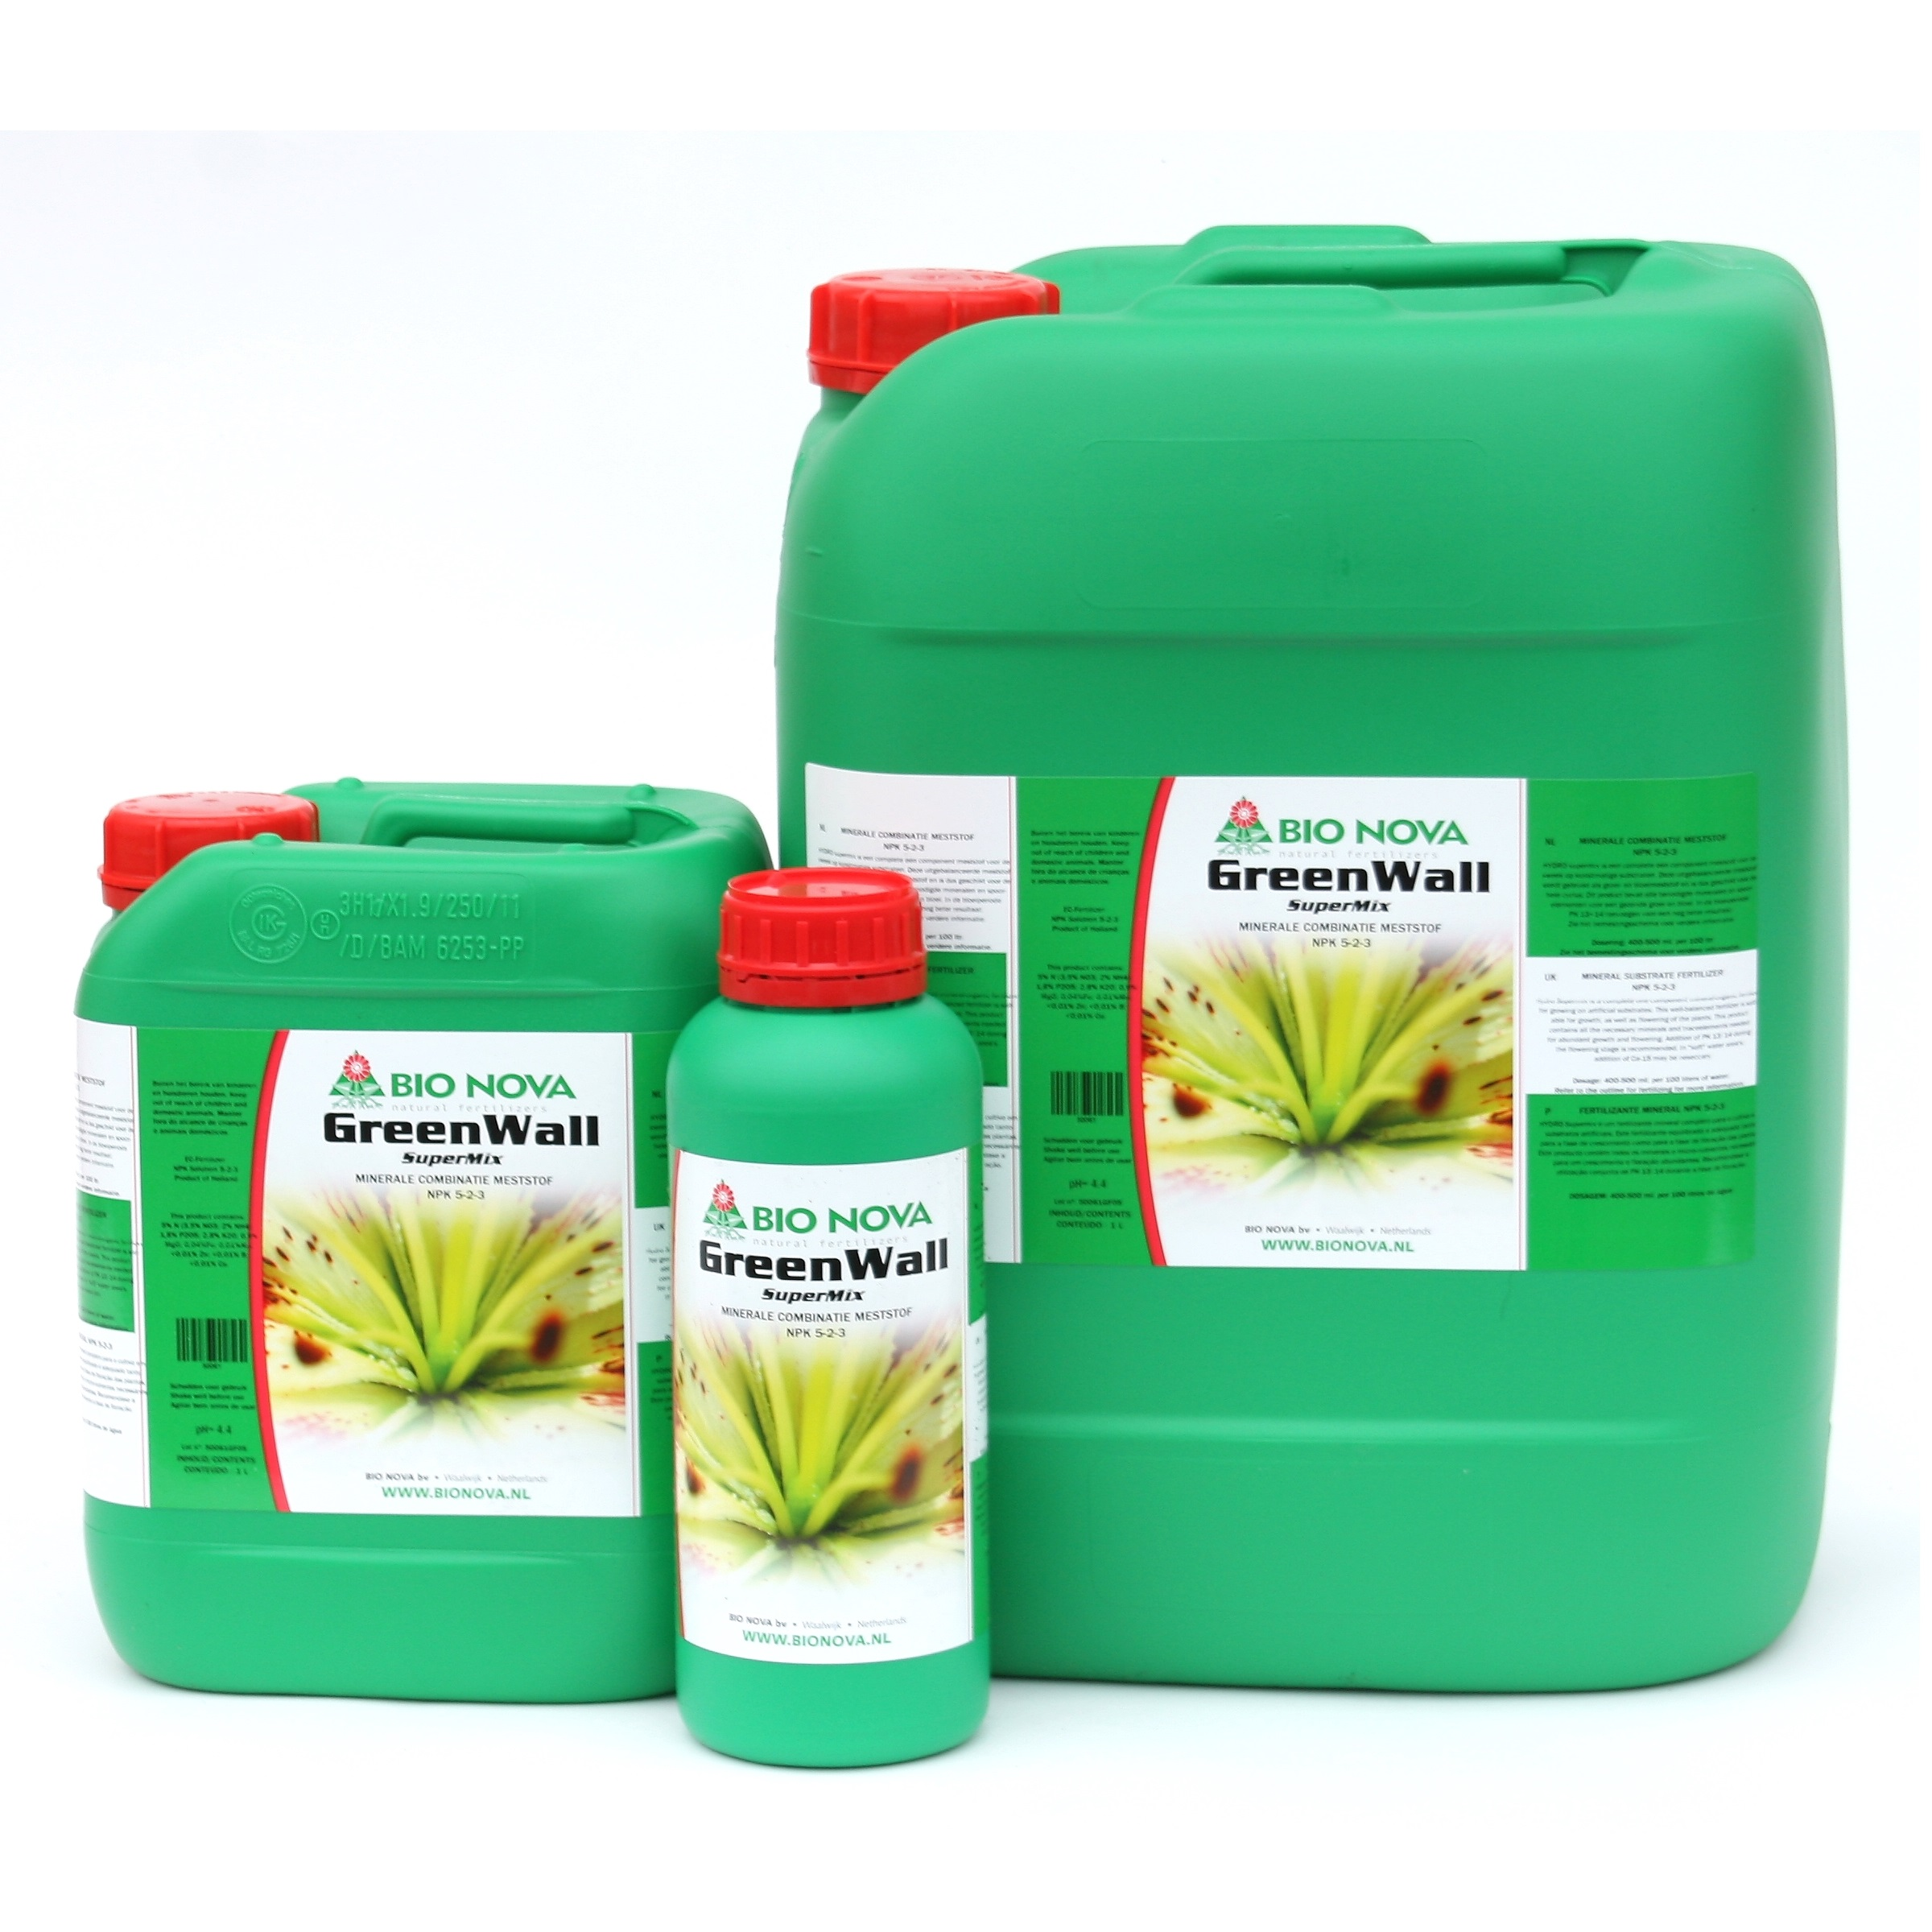 Bio Nova BN GreenWall SuperMix 1 Liter